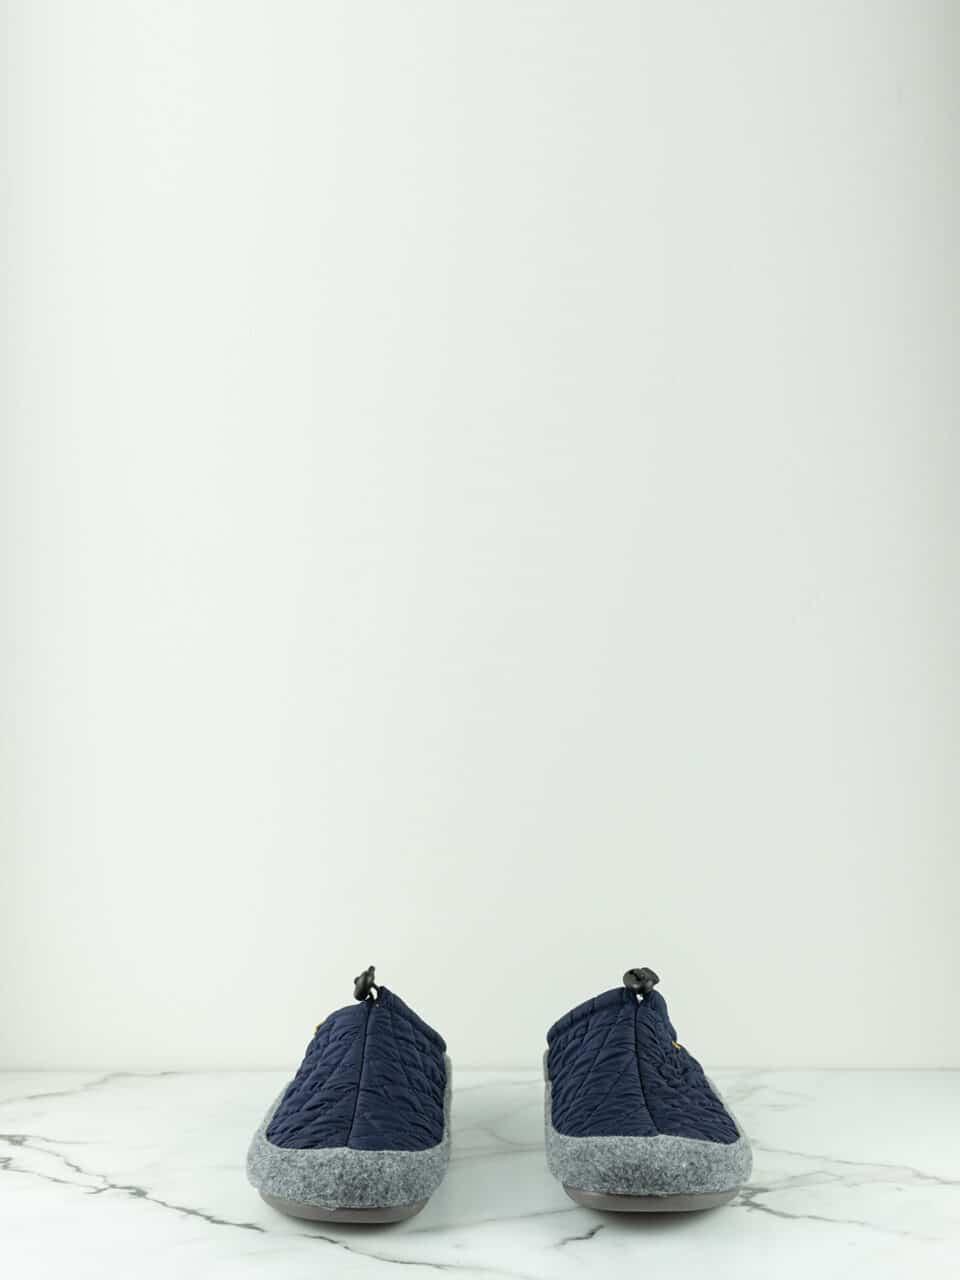 NADIR-UM MARINO Marcas en Loyna Shoes